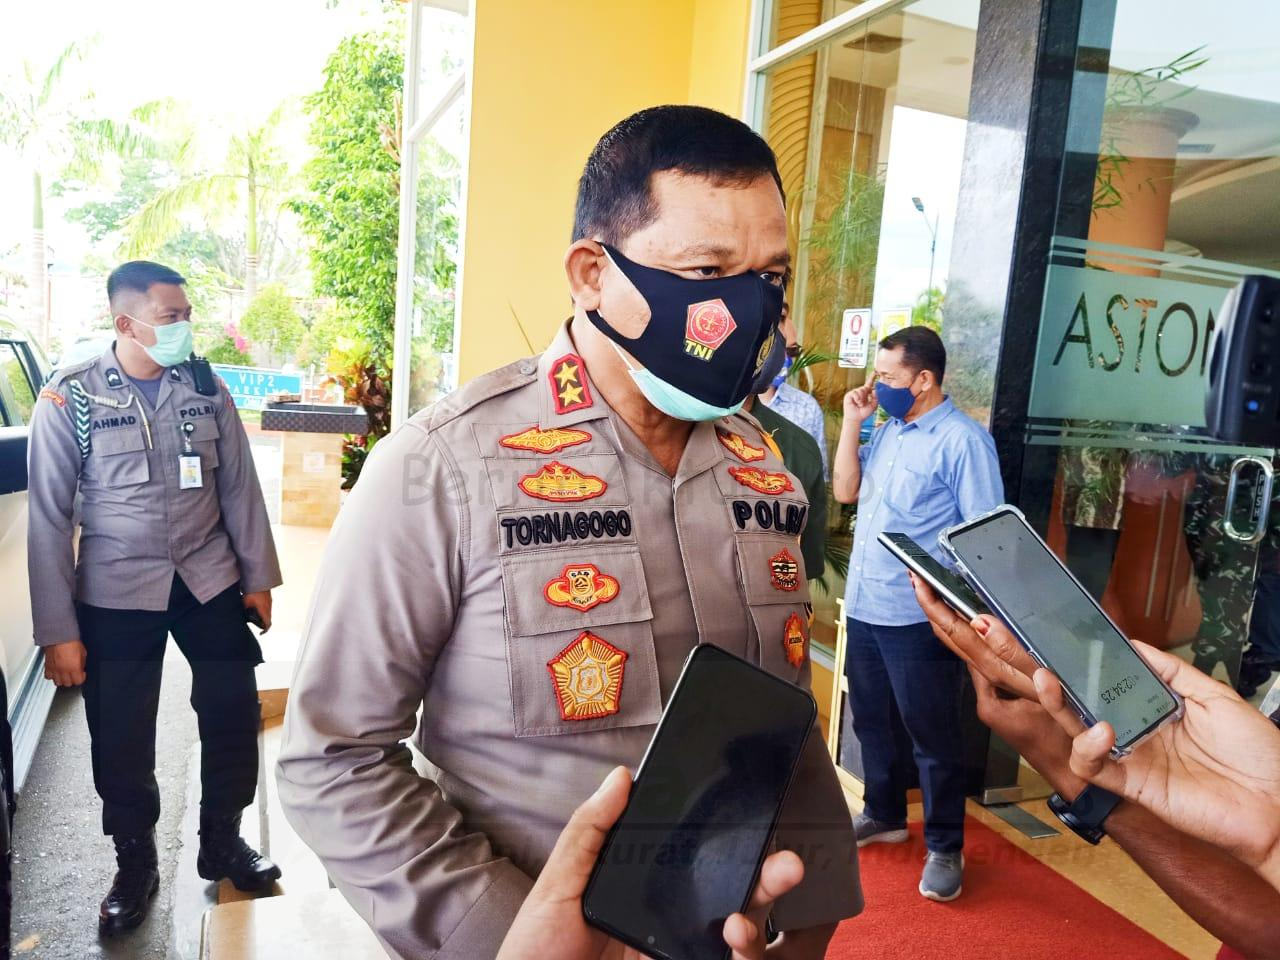 Kapolda PB: Warga Yang Tidak Pakai Masker Dapat Sanksi Baca Pancasila 4 IMG 20200926 WA0032